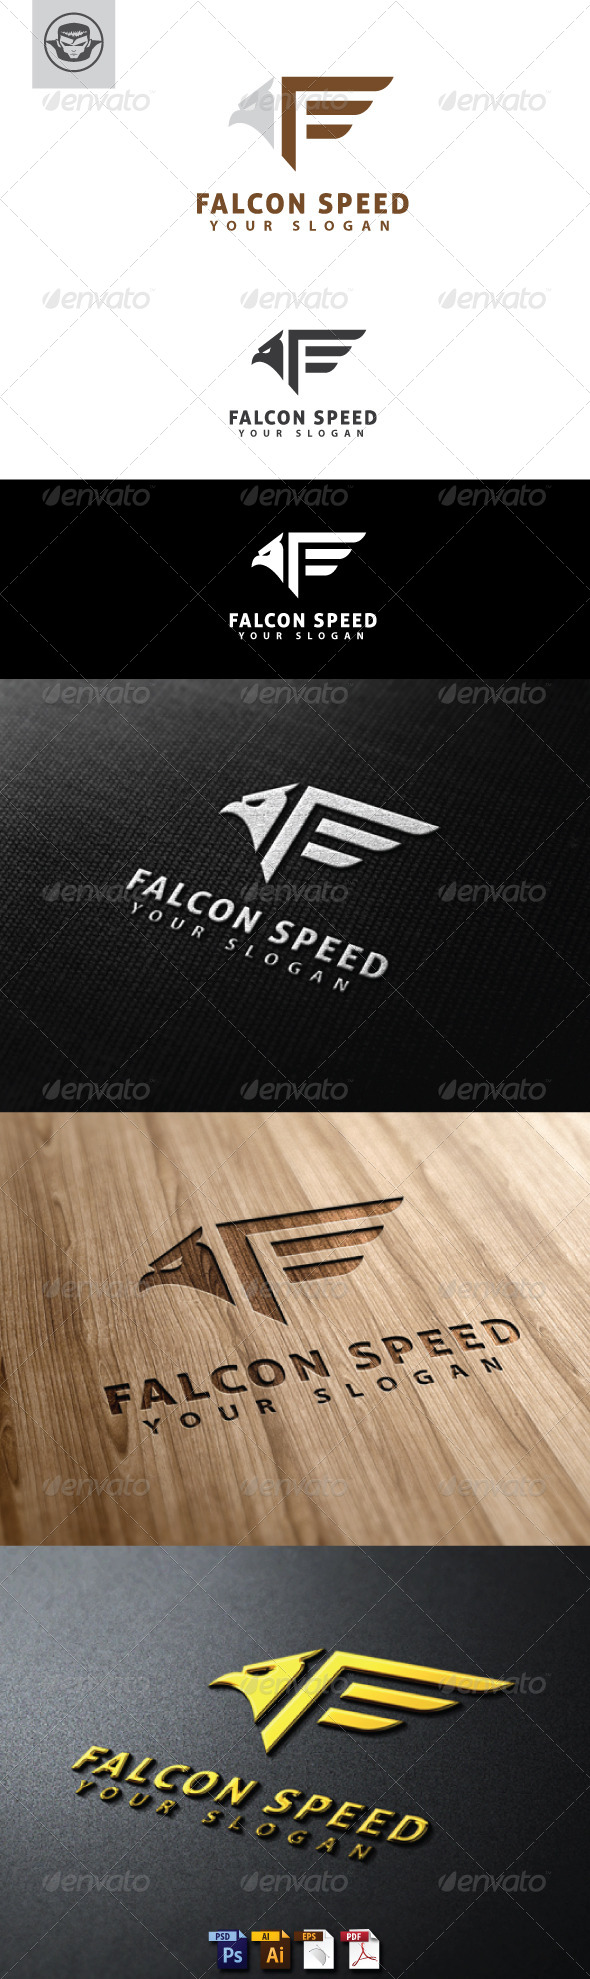 Falcon Speed Logo Template - Animals Logo Templates